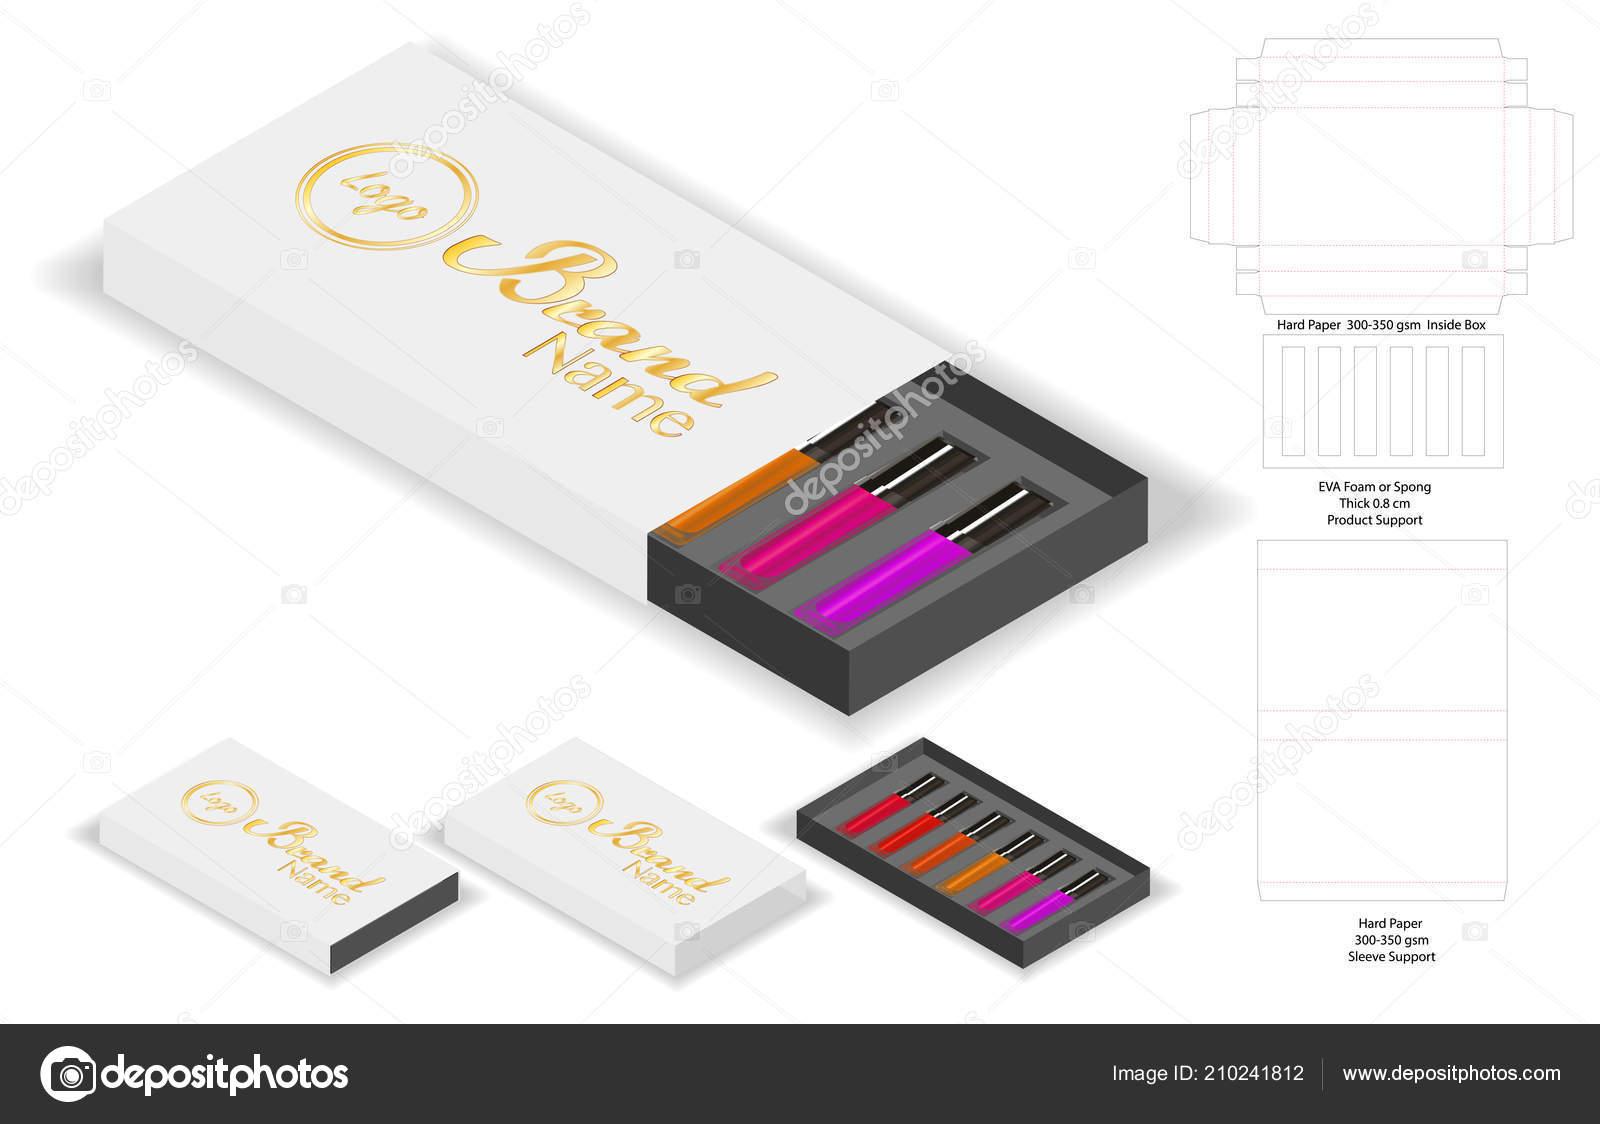 Paper Box Shape Lipsticks Package Dieline — Stock Vector